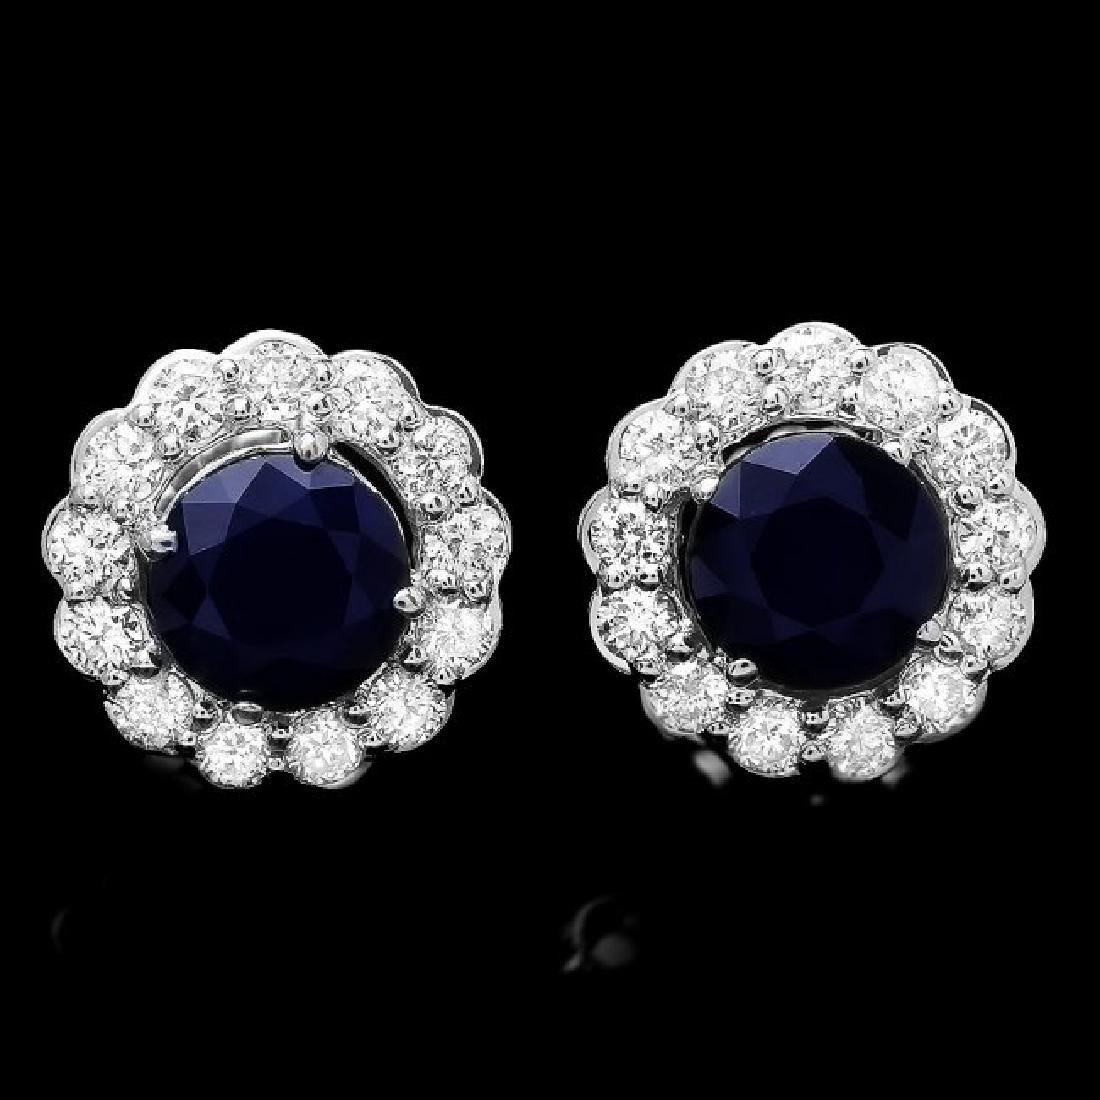 14k Gold 3.70ct Sapphire 1.5ct Diamond Earrings - 2